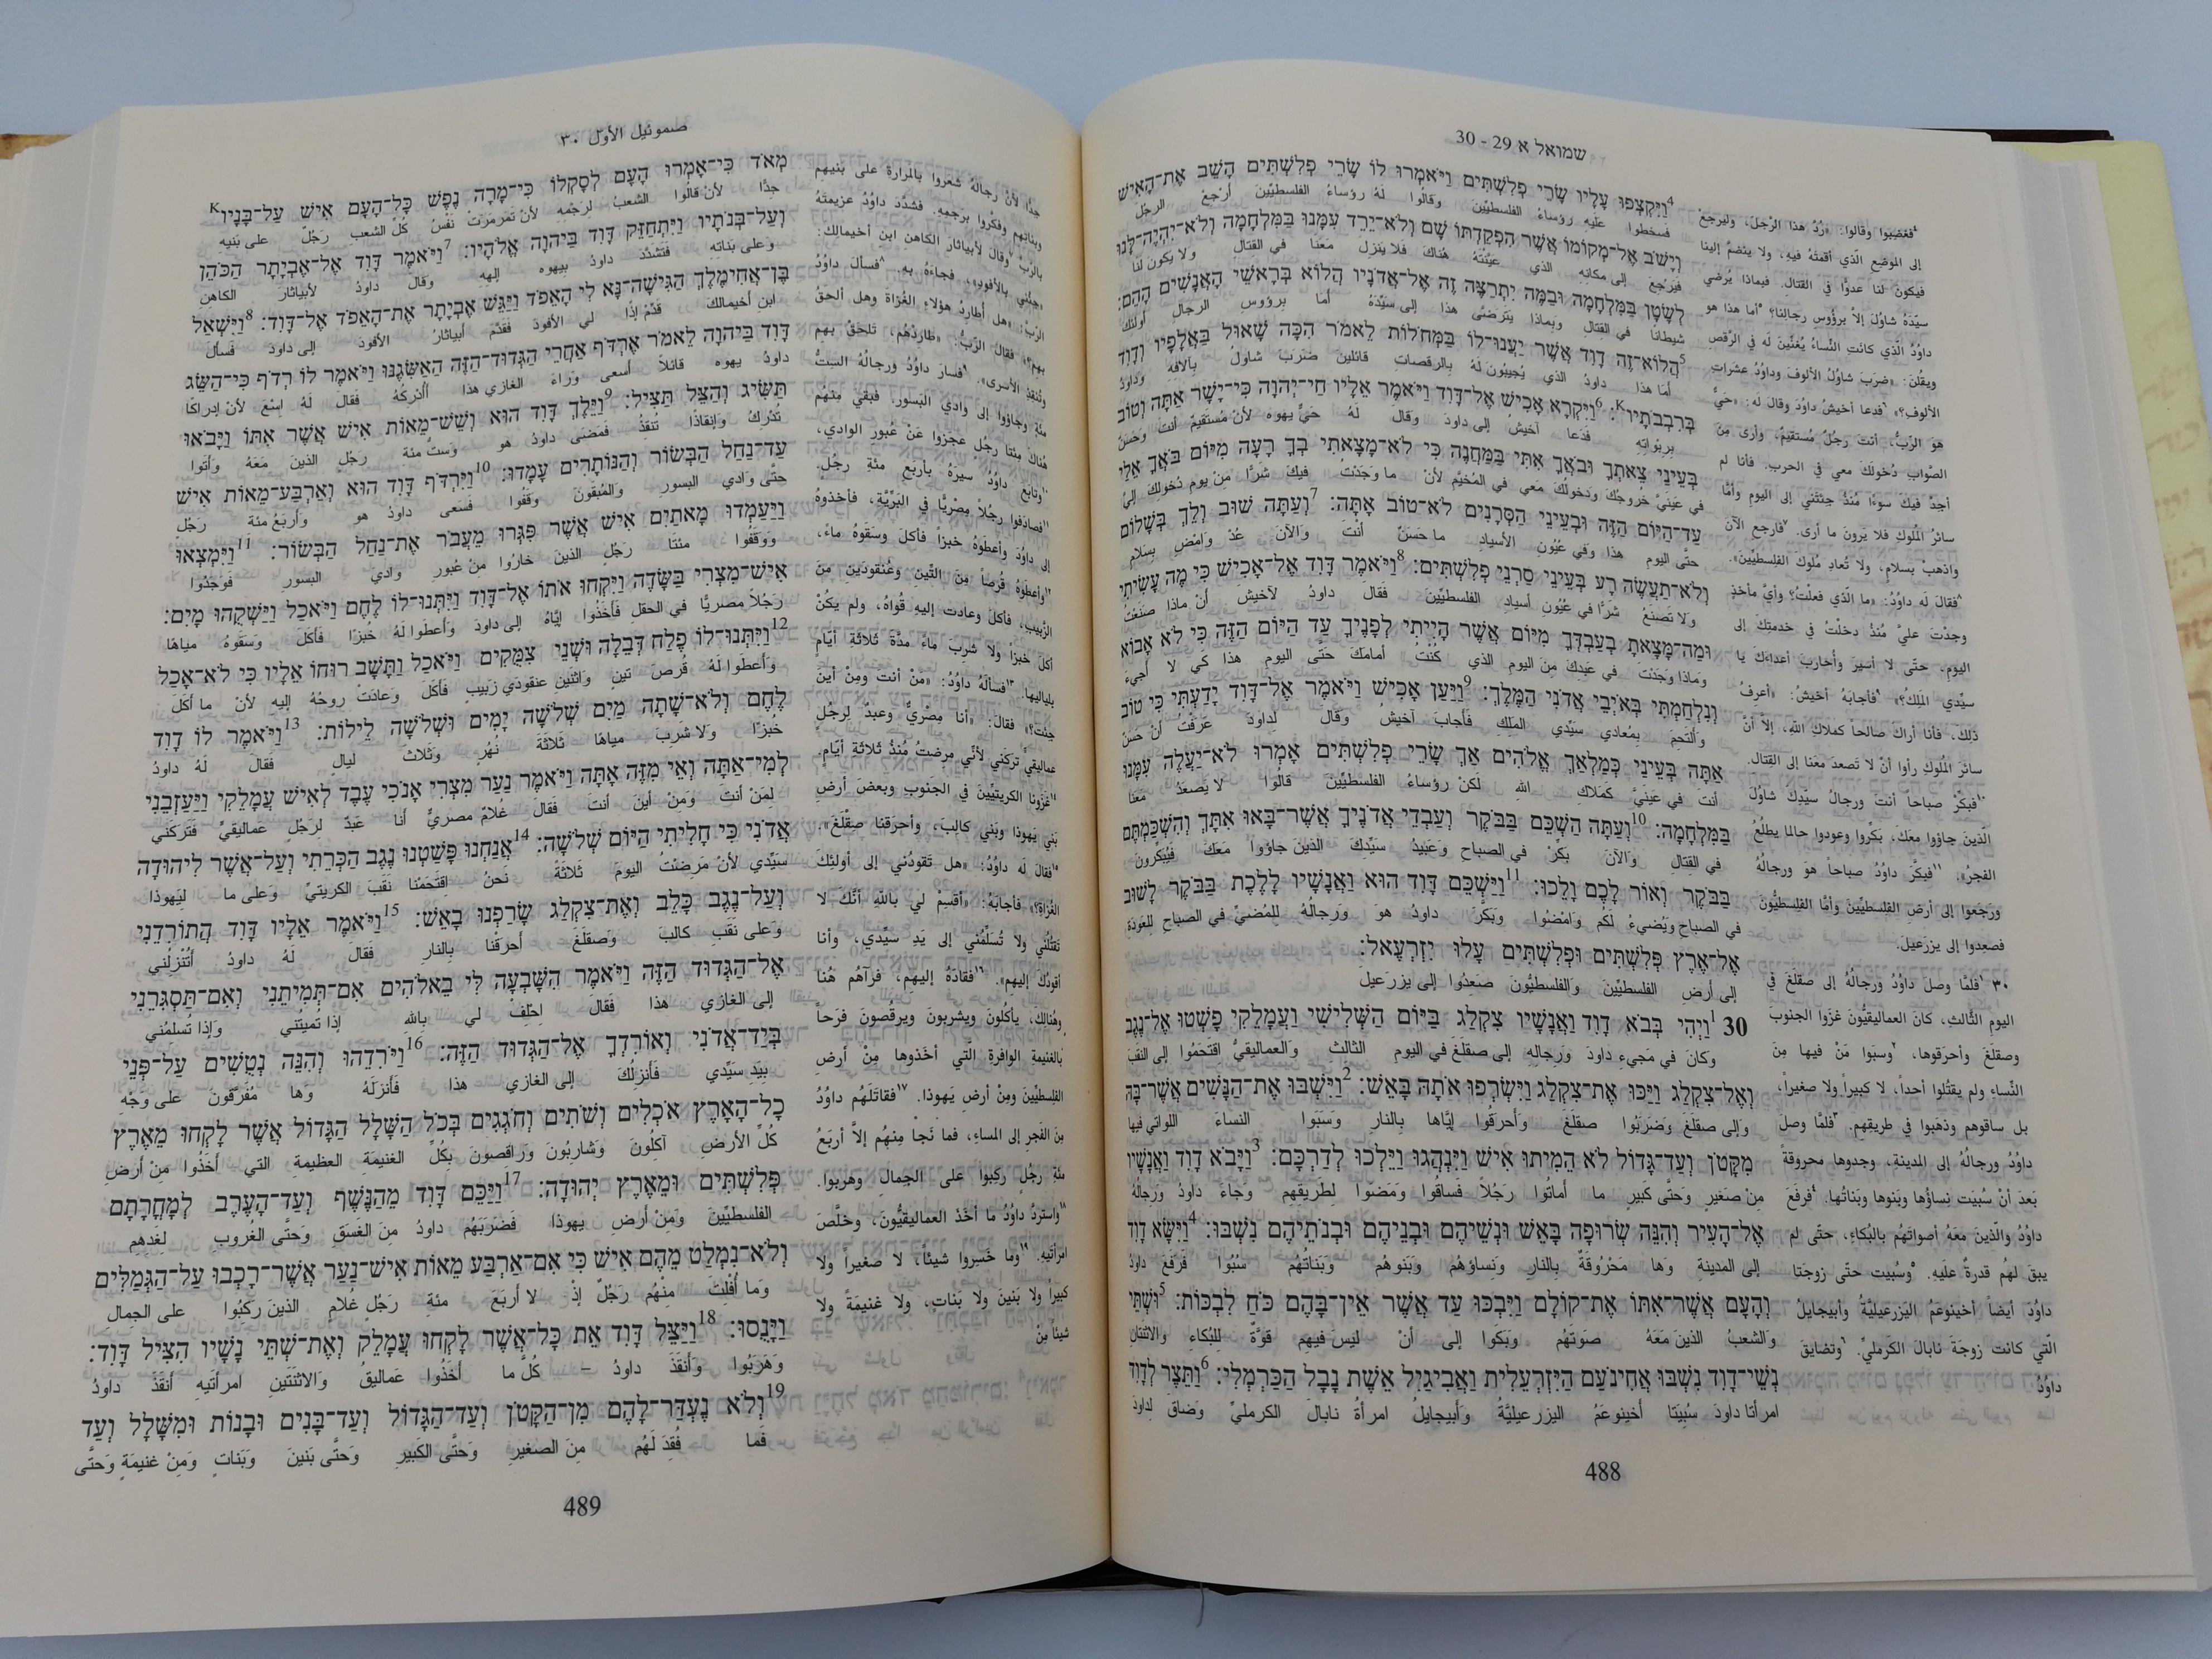 hebrew-old-testament-interlinear-hebrew-arabic-old-testament-ancien-testament-hebreu-interlineaire-hebreu-arabe-paul-feghali-antoine-aoukar-universite-ant-7-.jpg